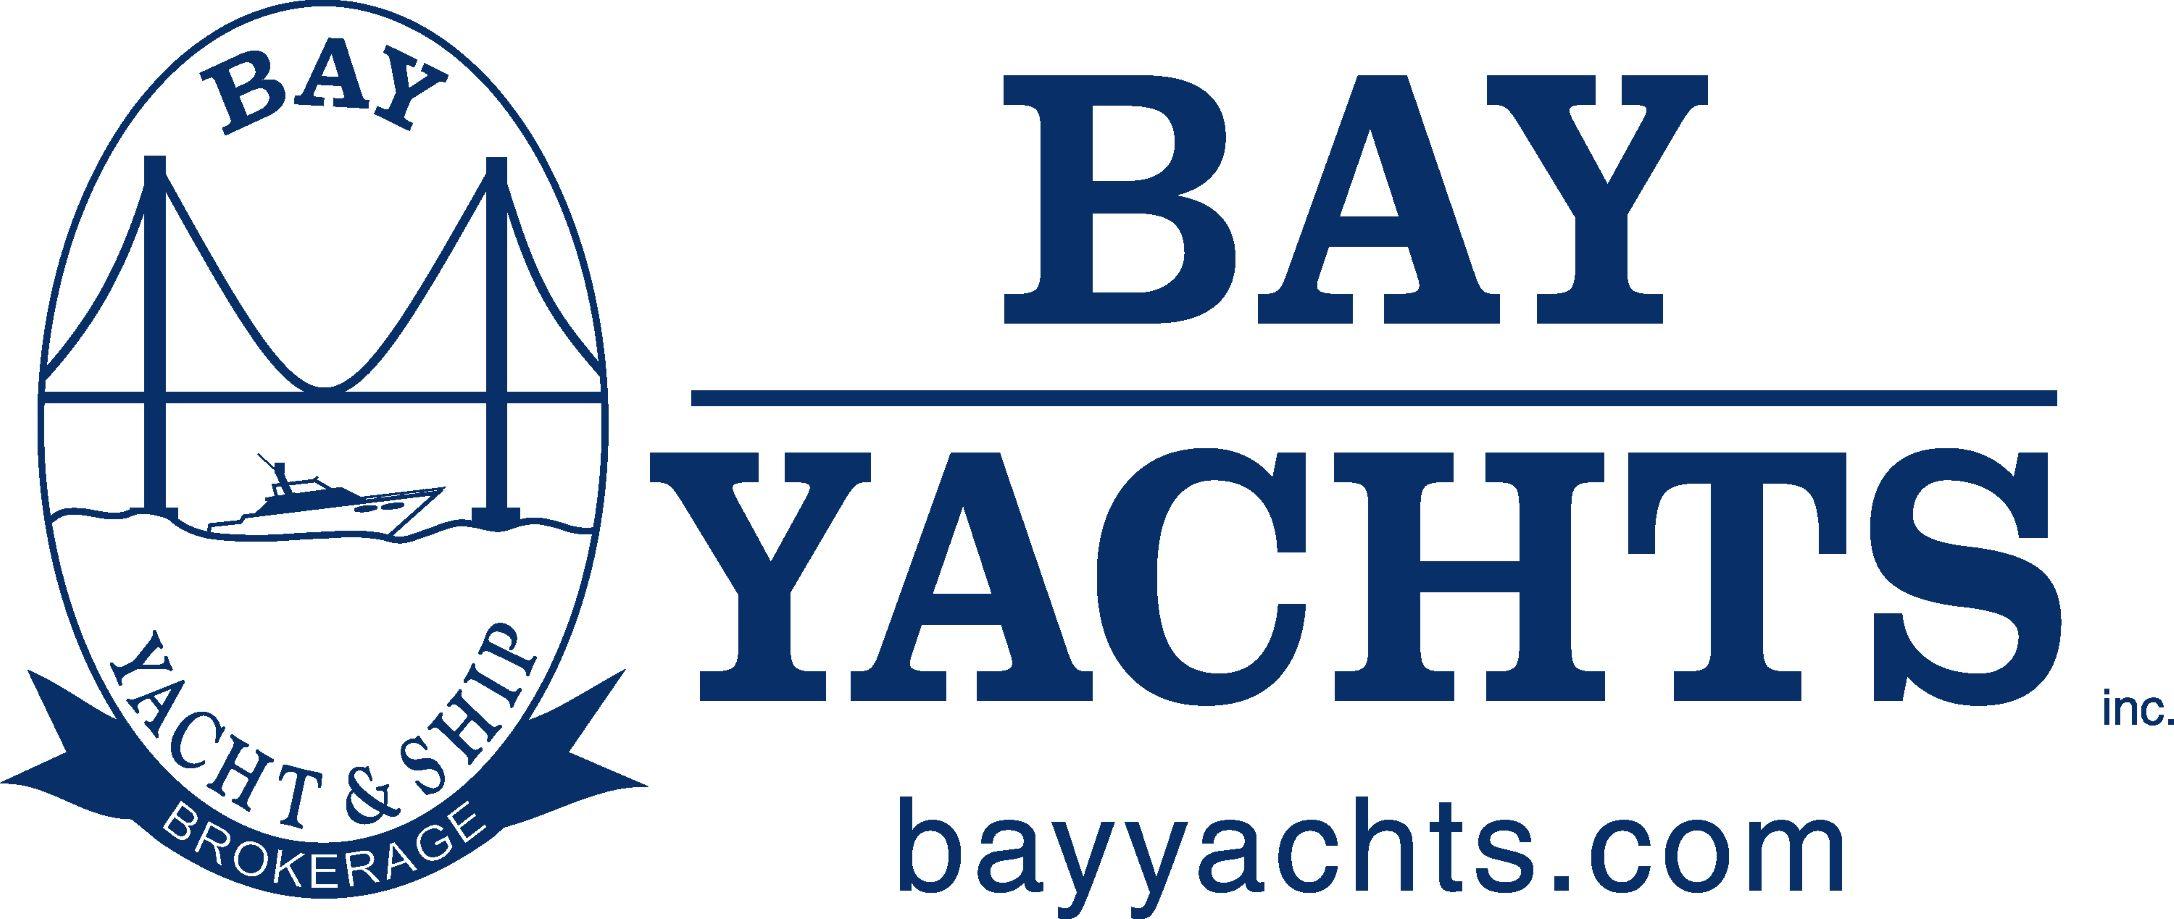 Bay Yachts